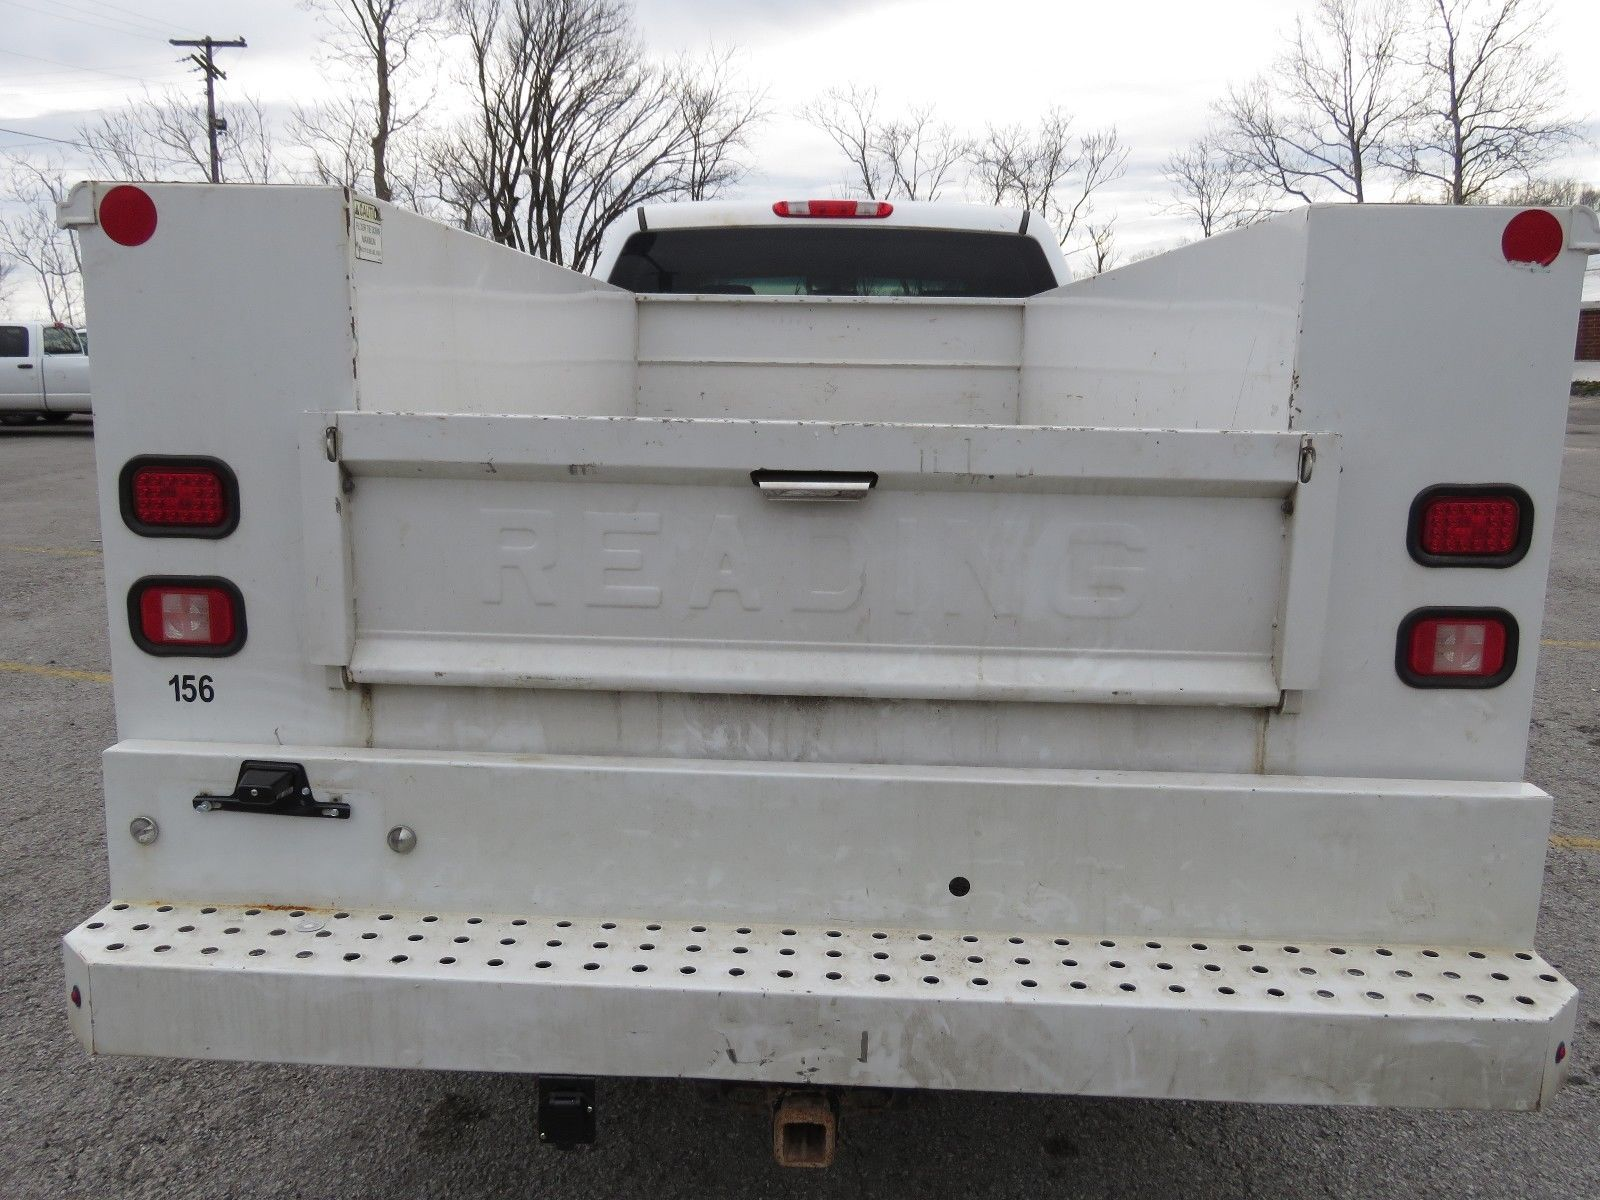 utility bed 2012 Chevrolet Silverado 2500 lifted